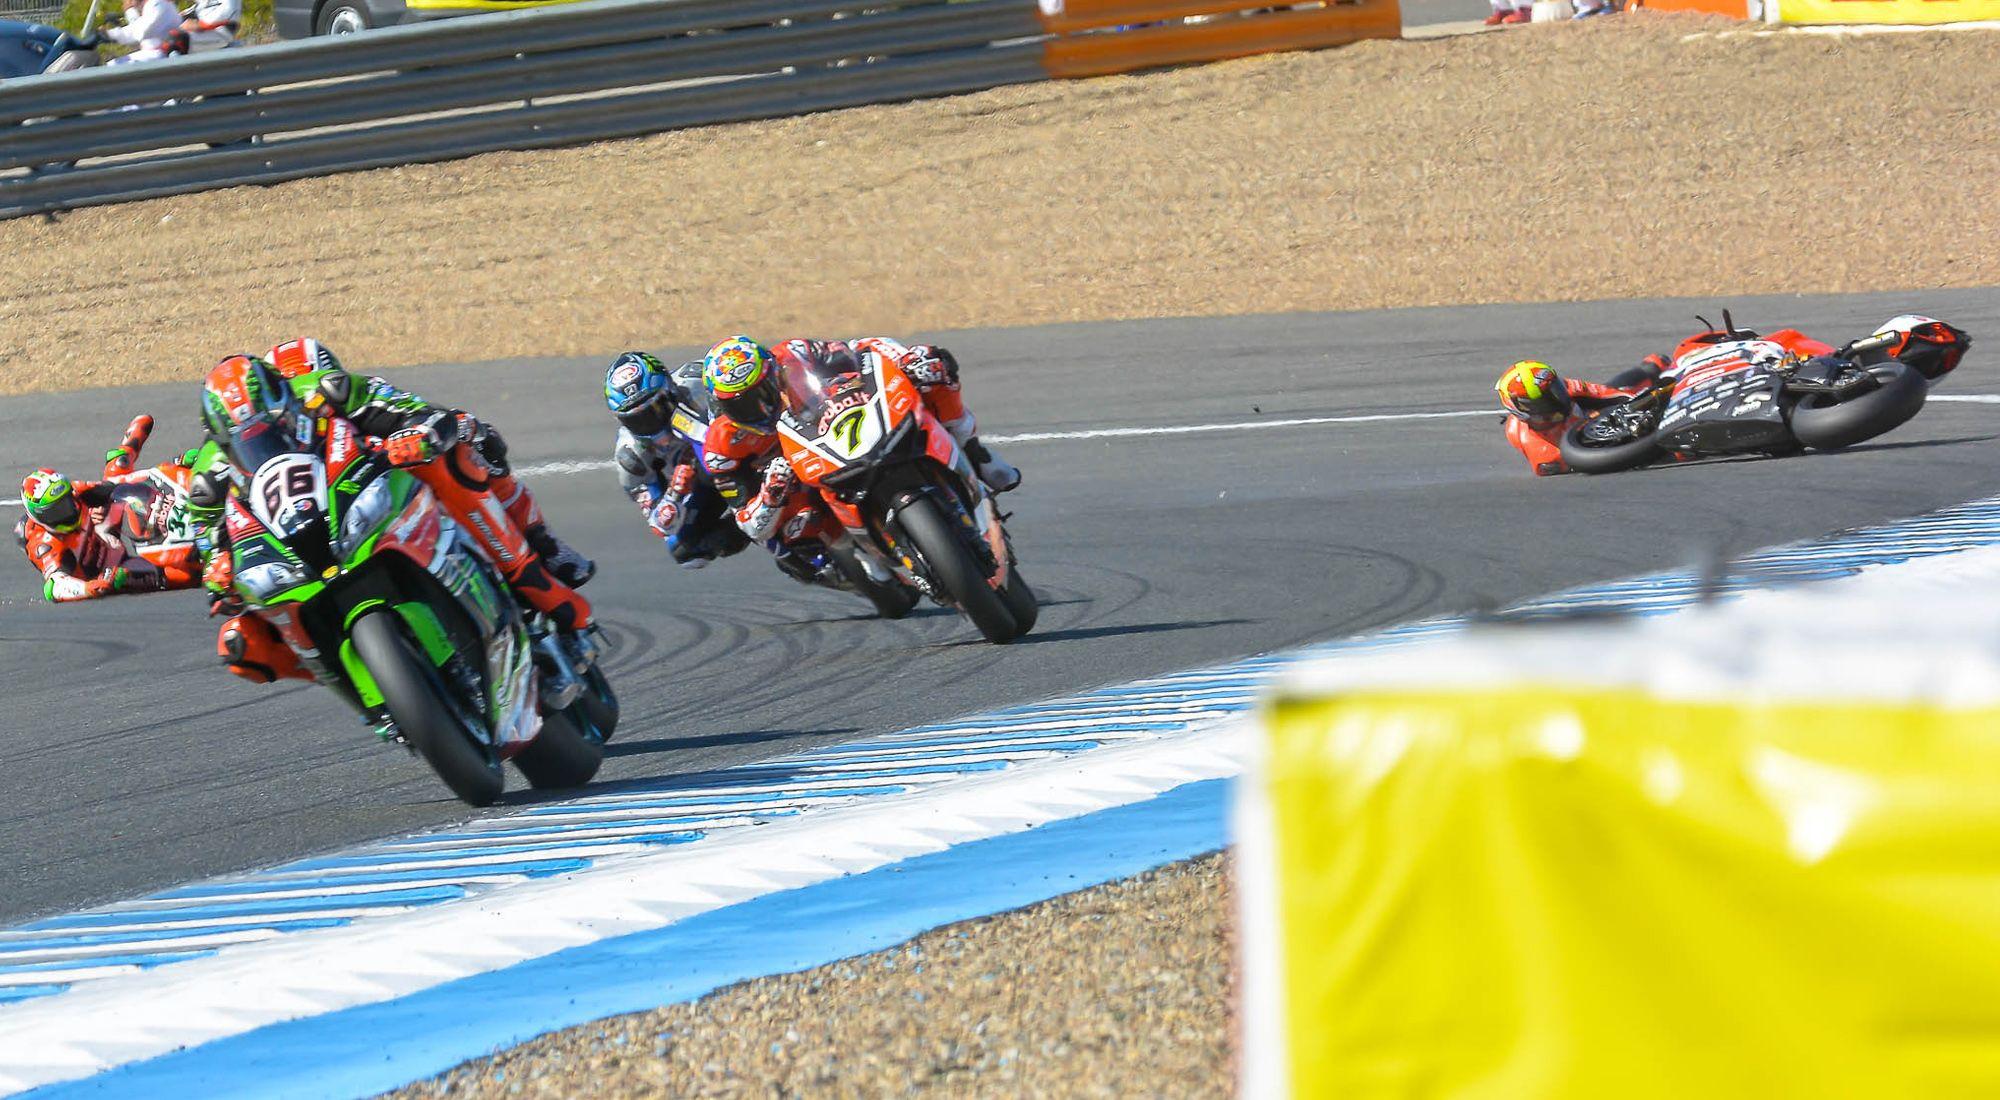 Caída en Superbike | Christian Cantizano para MIRA Jerez